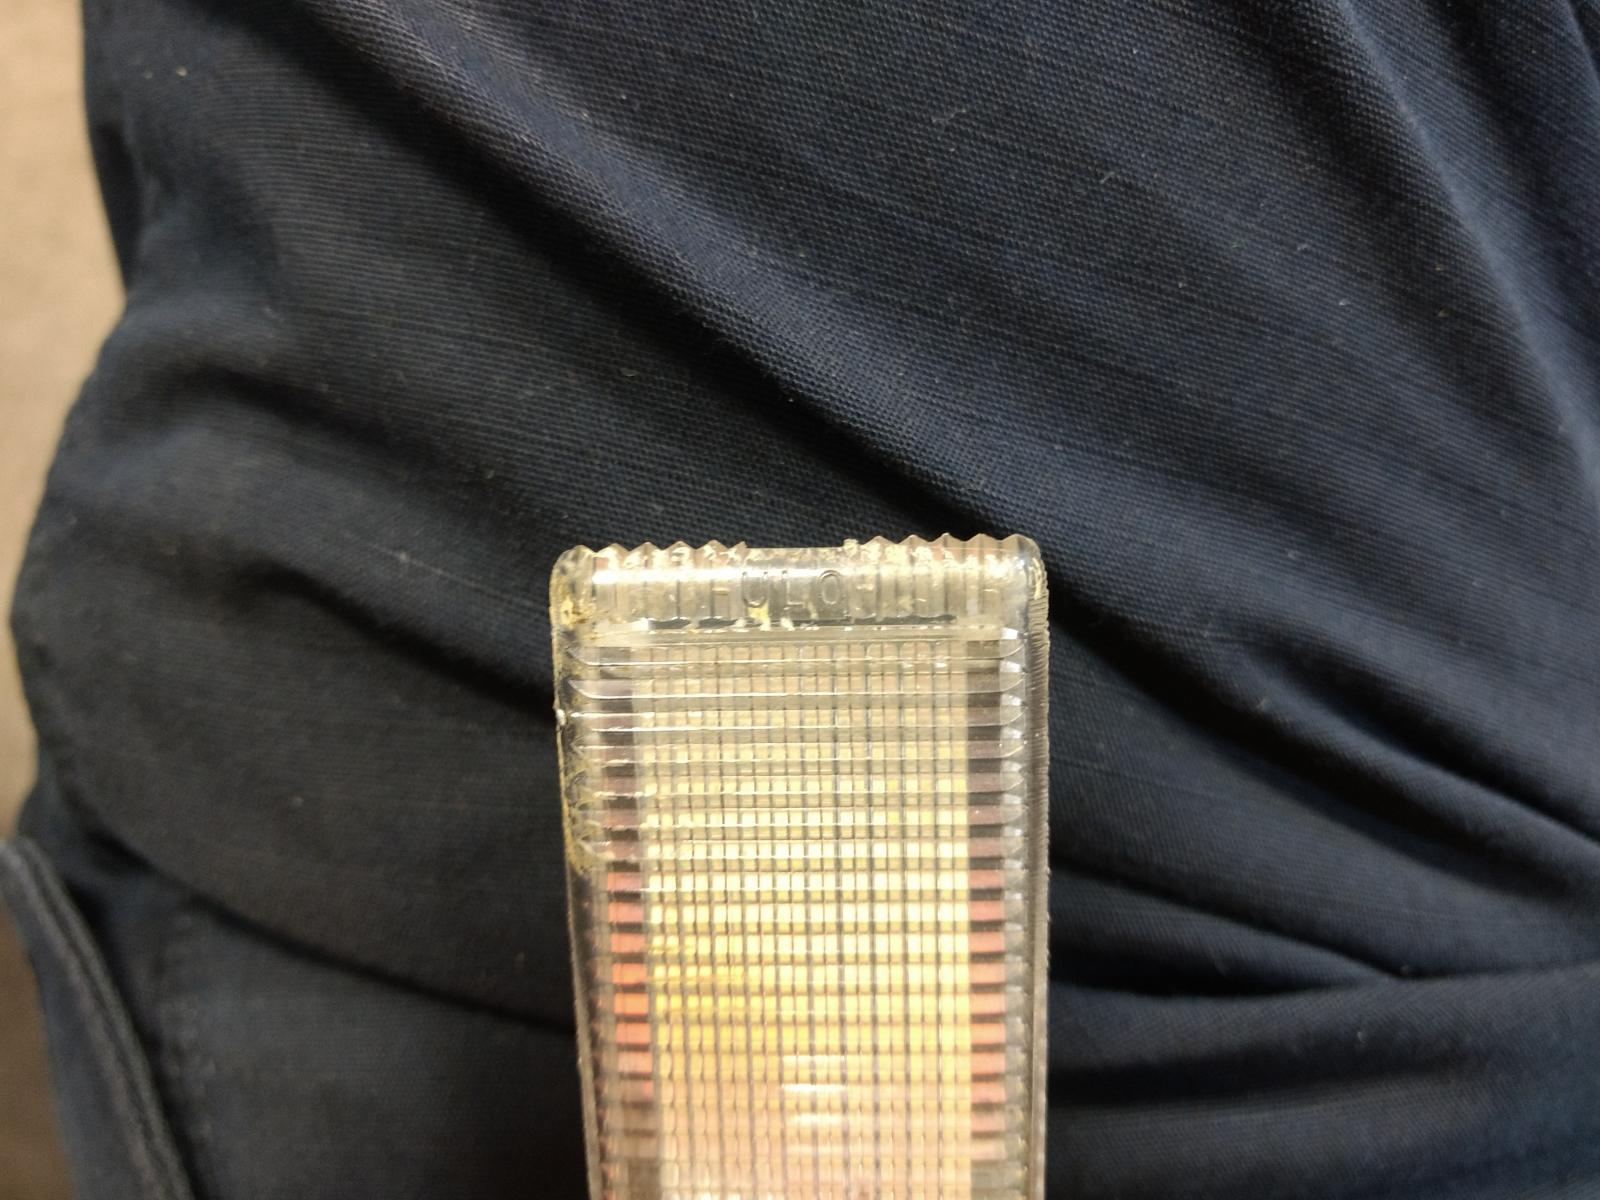 Vanagon glove box light